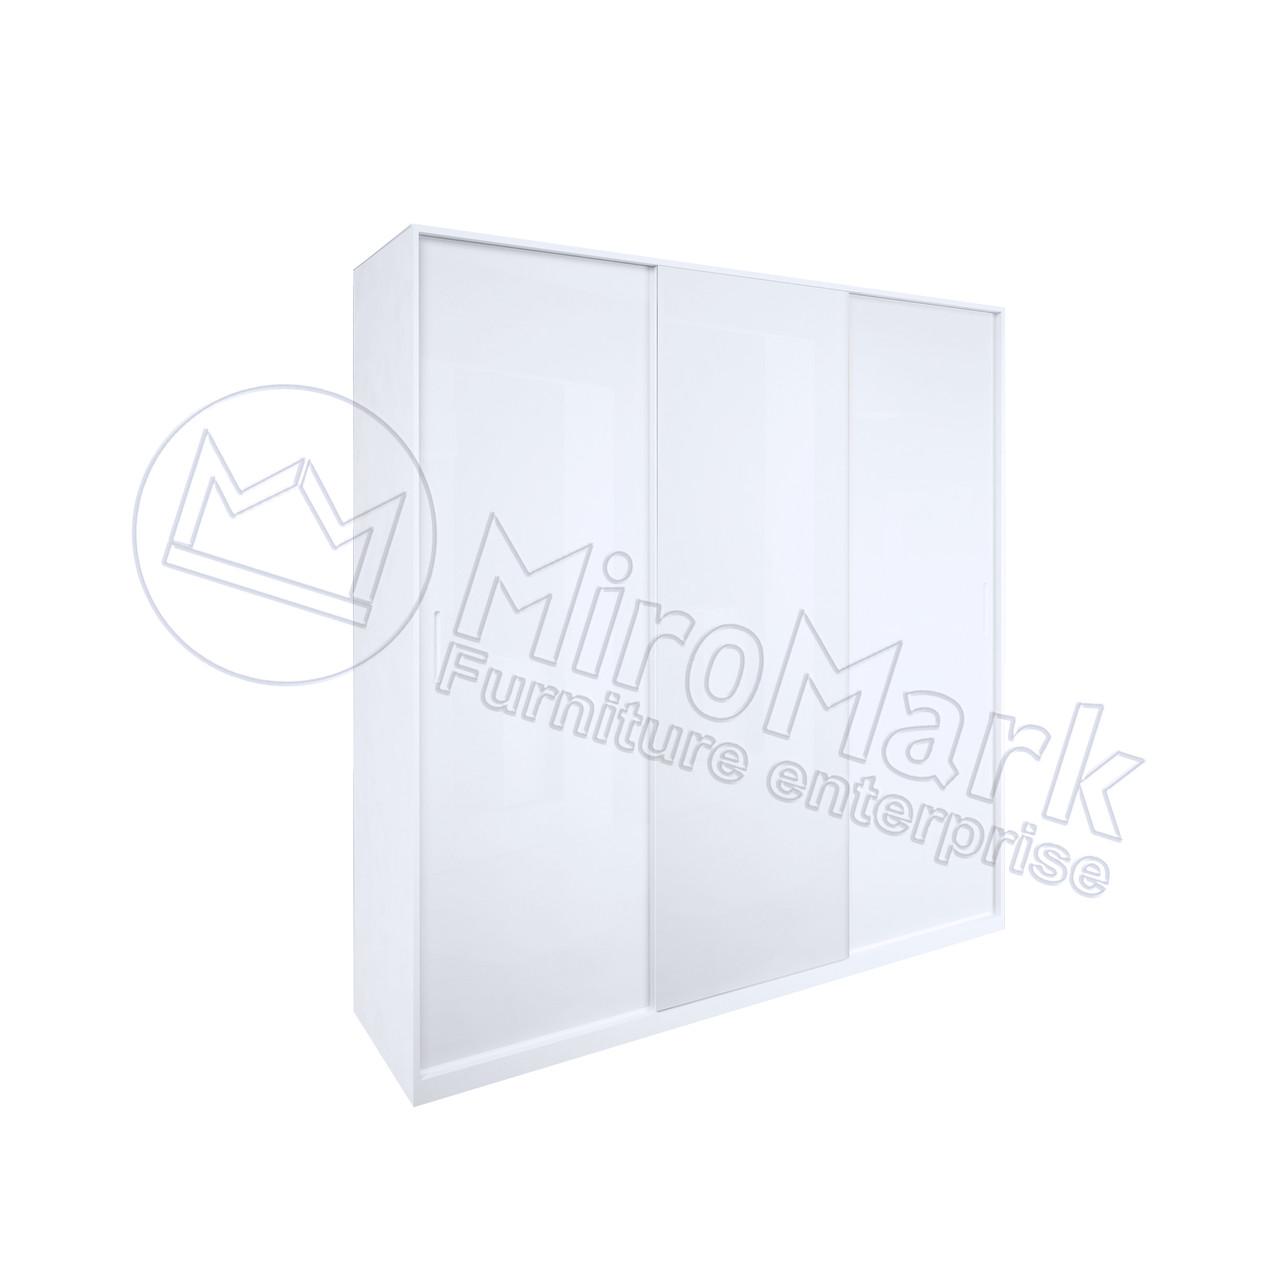 Шкаф-купе 2 м Рома без зеркала глянец белый TM Миро Марк